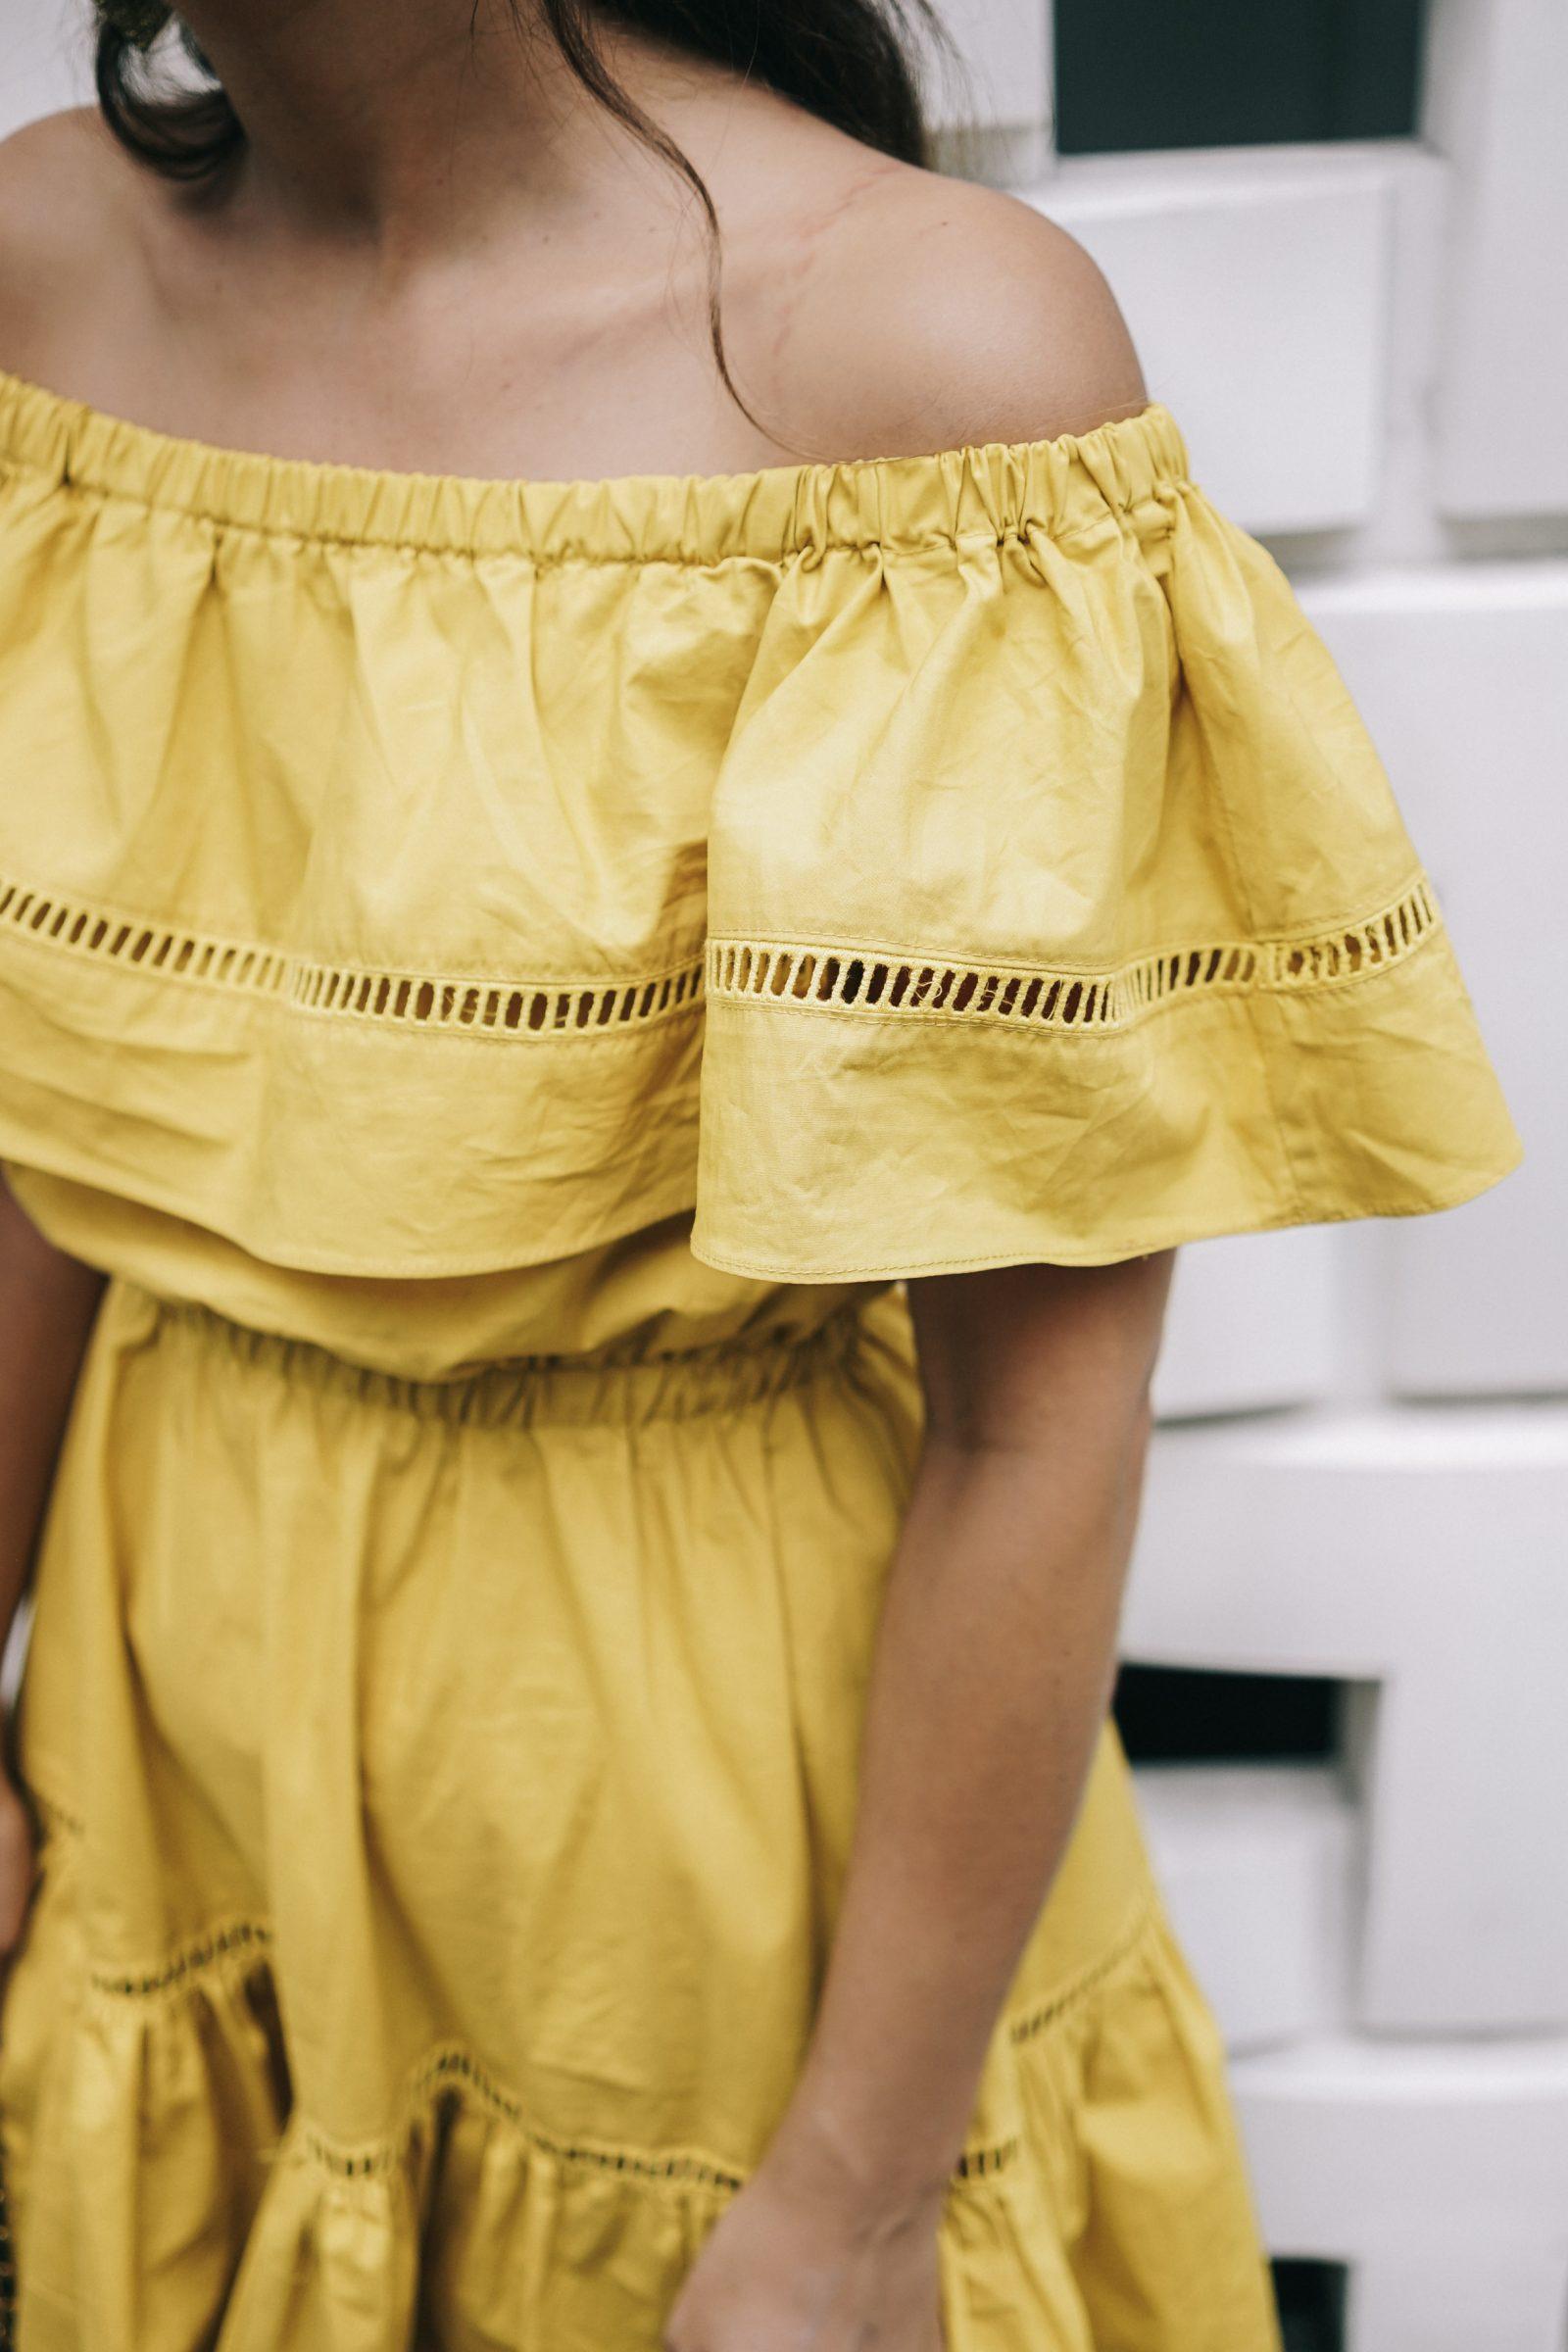 tokyo_travel_guide-outfit-collage_vintage-street_style-off_the_shoulders_dress-mustard_dress-soludos_sandals-chanel_vintage-bag-vintage_stores-55